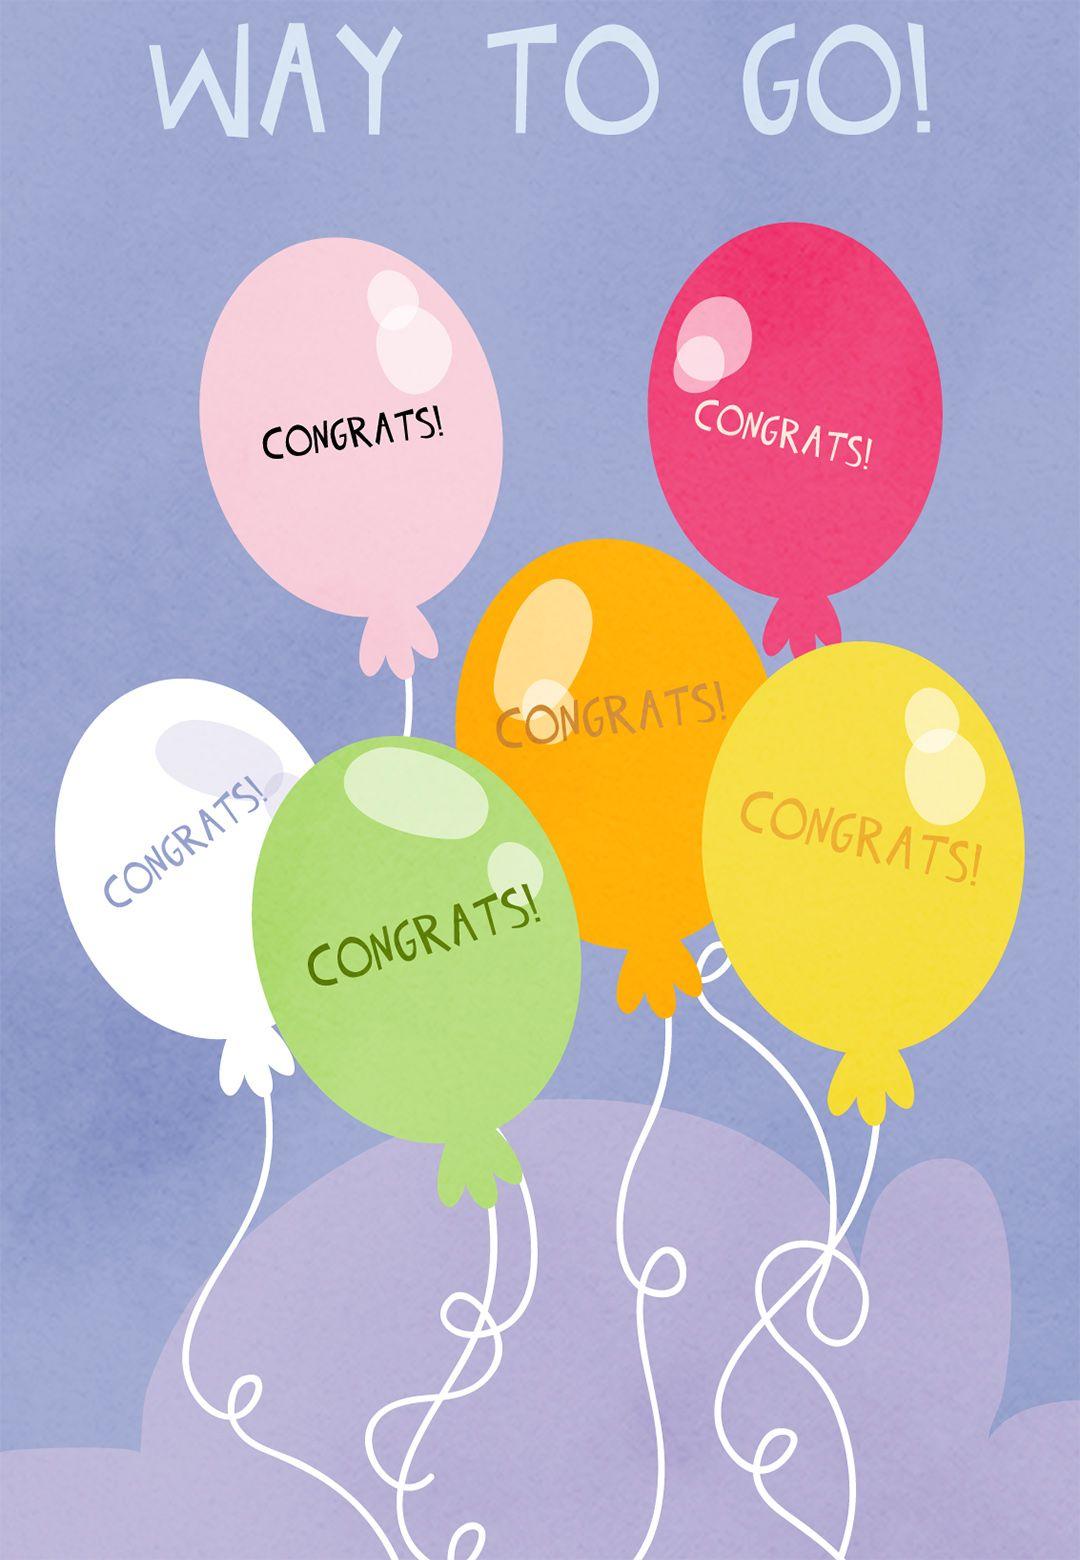 Congratulation On Your New Job Congratulations Card Free Greetings Island New Job Congratulations Congrats On New Job Congratulations Images